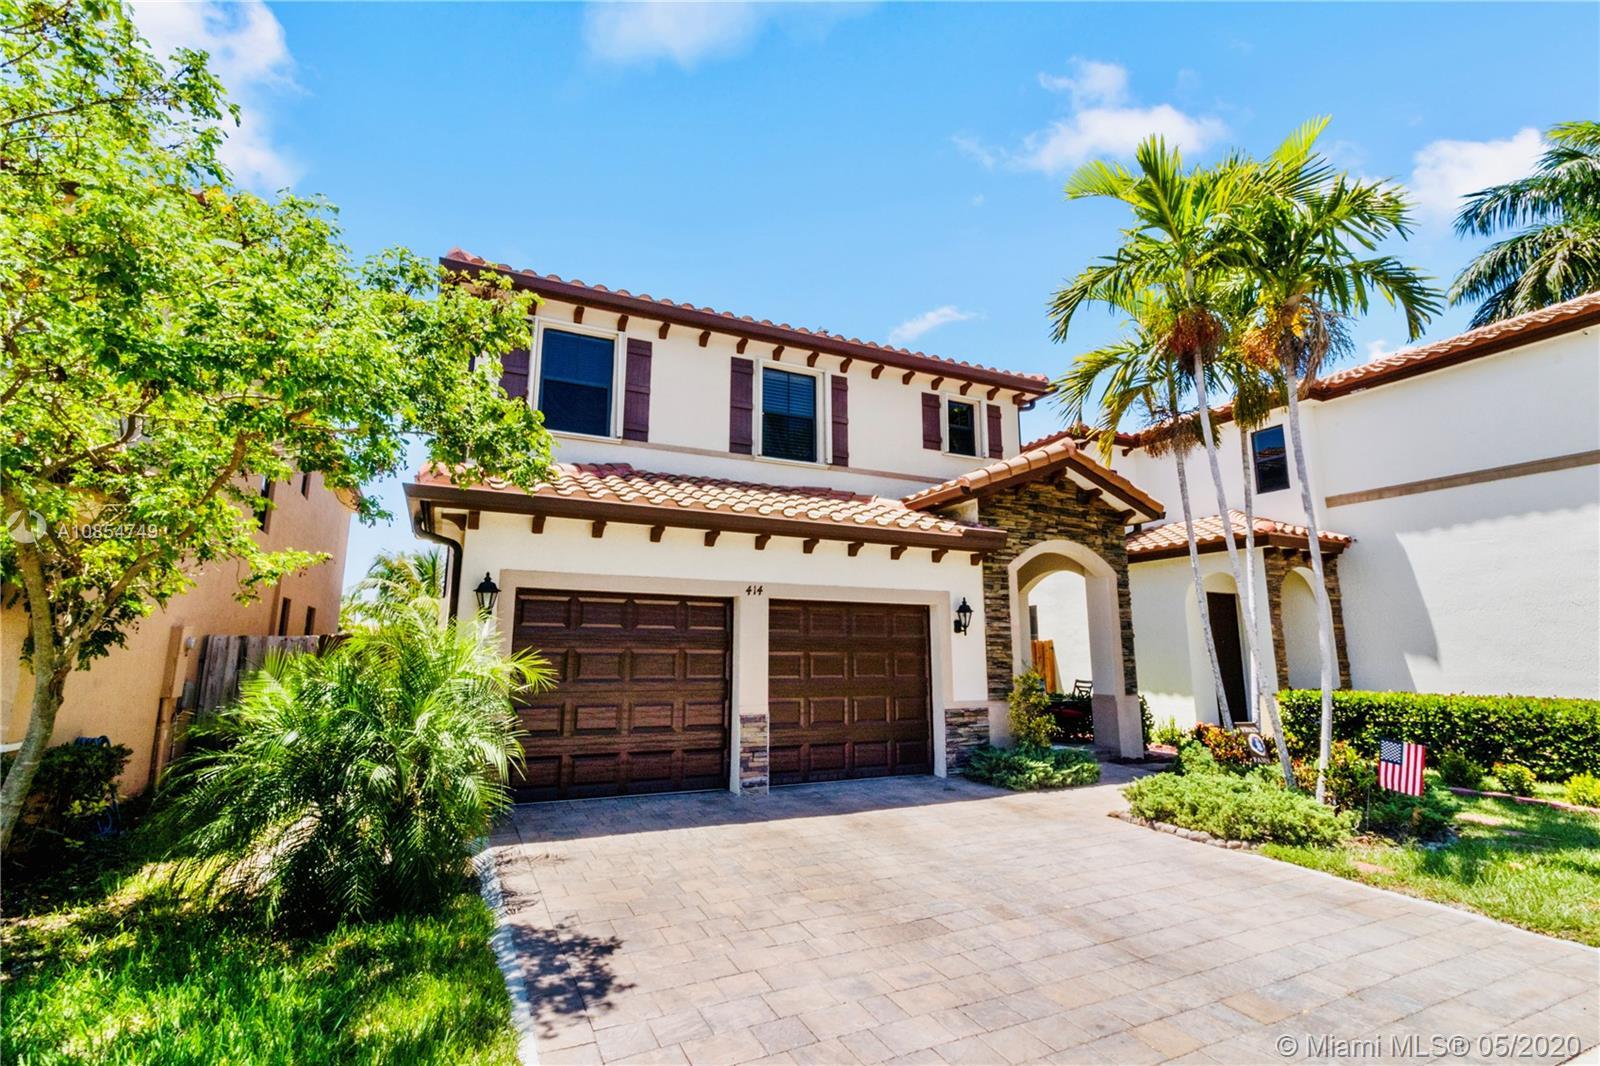 414 SE 34th Ter, Homestead, FL 33033 - Homestead, FL real estate listing